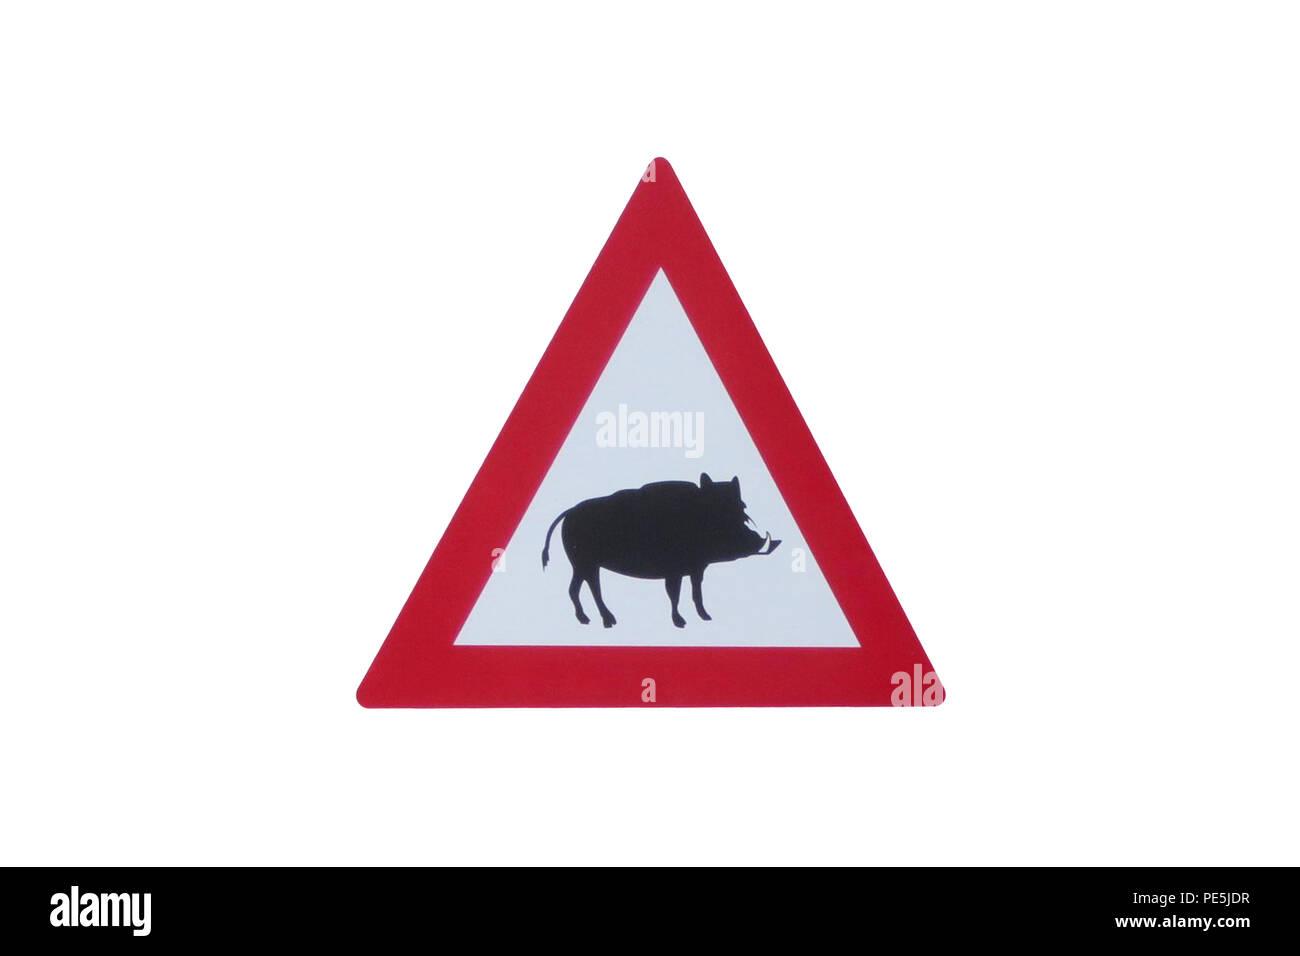 Road Sign - Road Sign - Attention Wildlife - Boar - Wildlife Danger - Stock Image